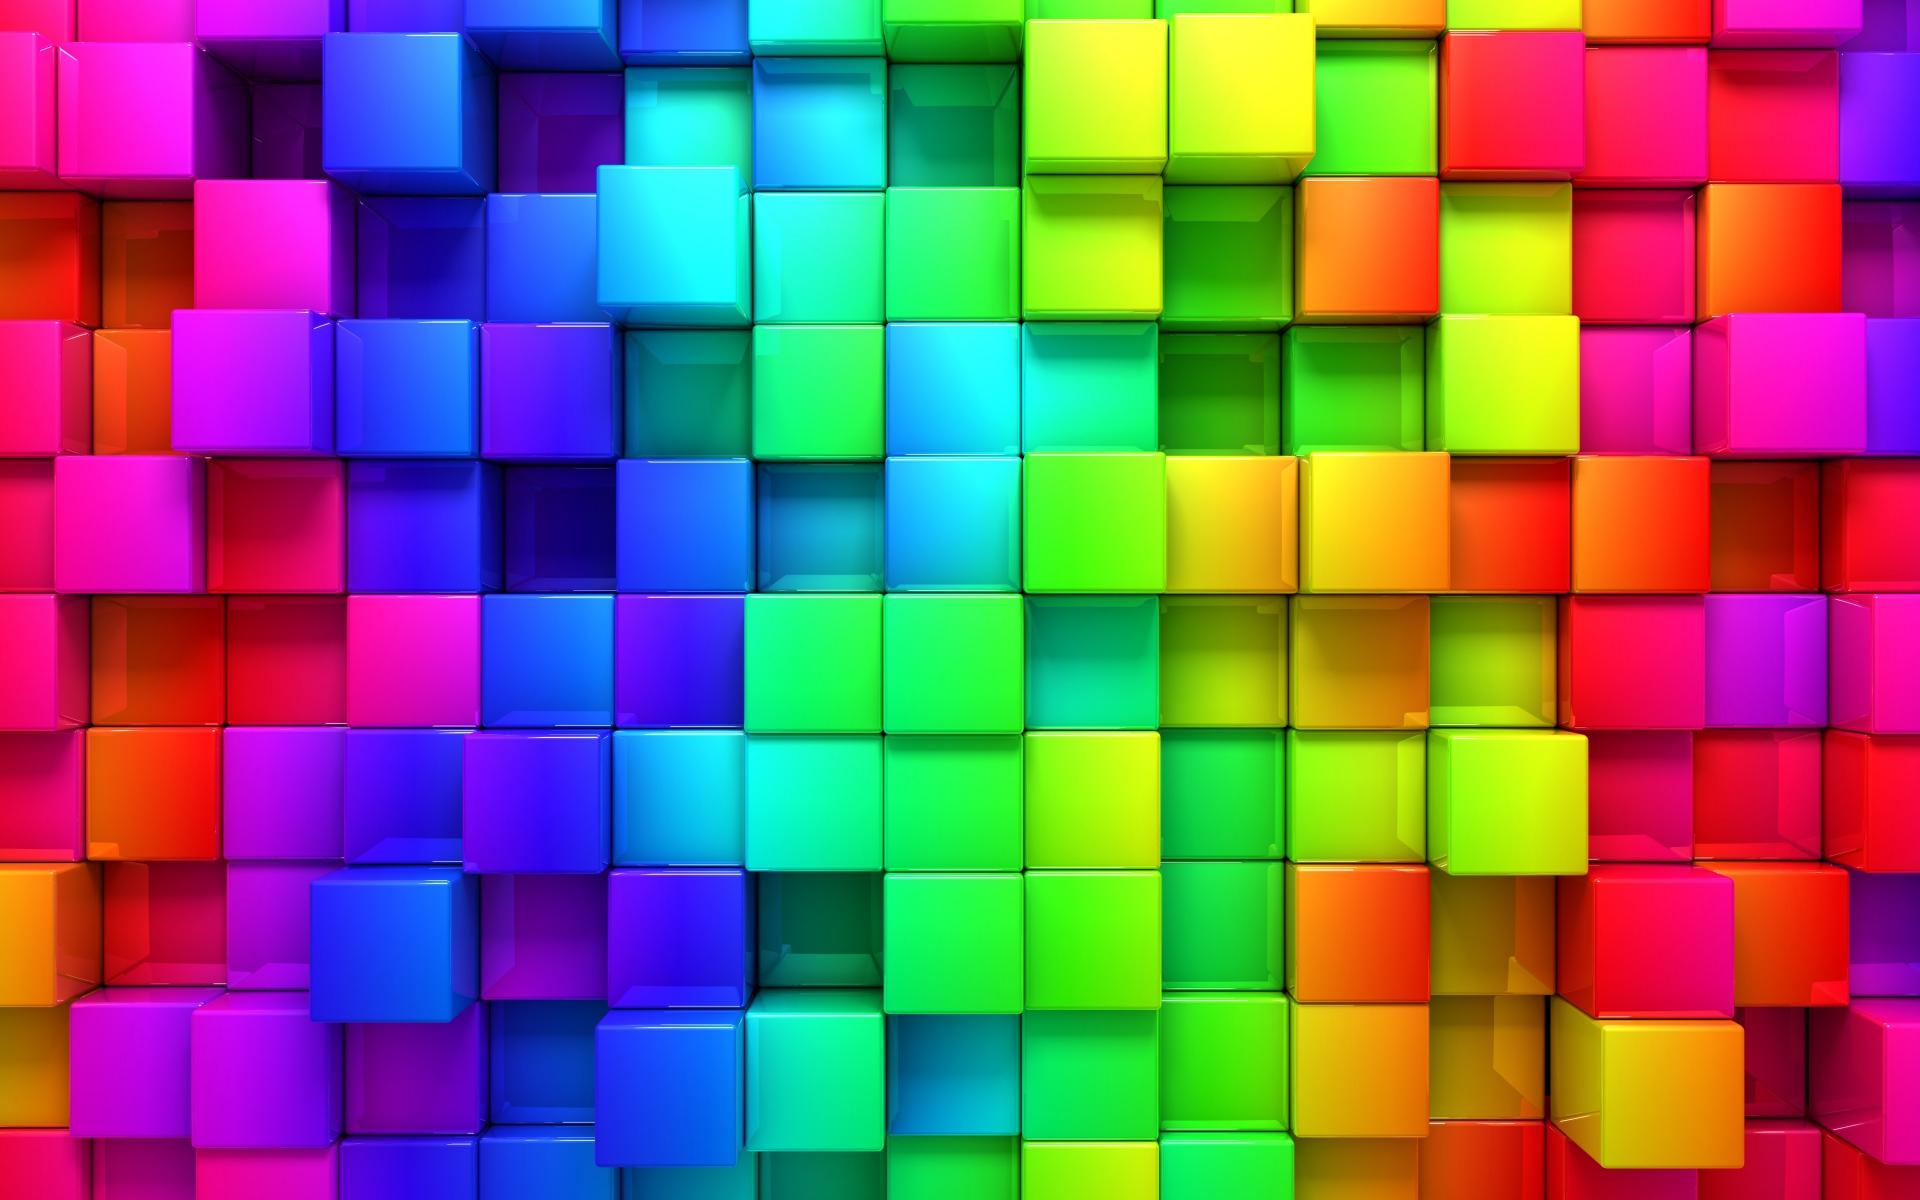 digital hd colourful image